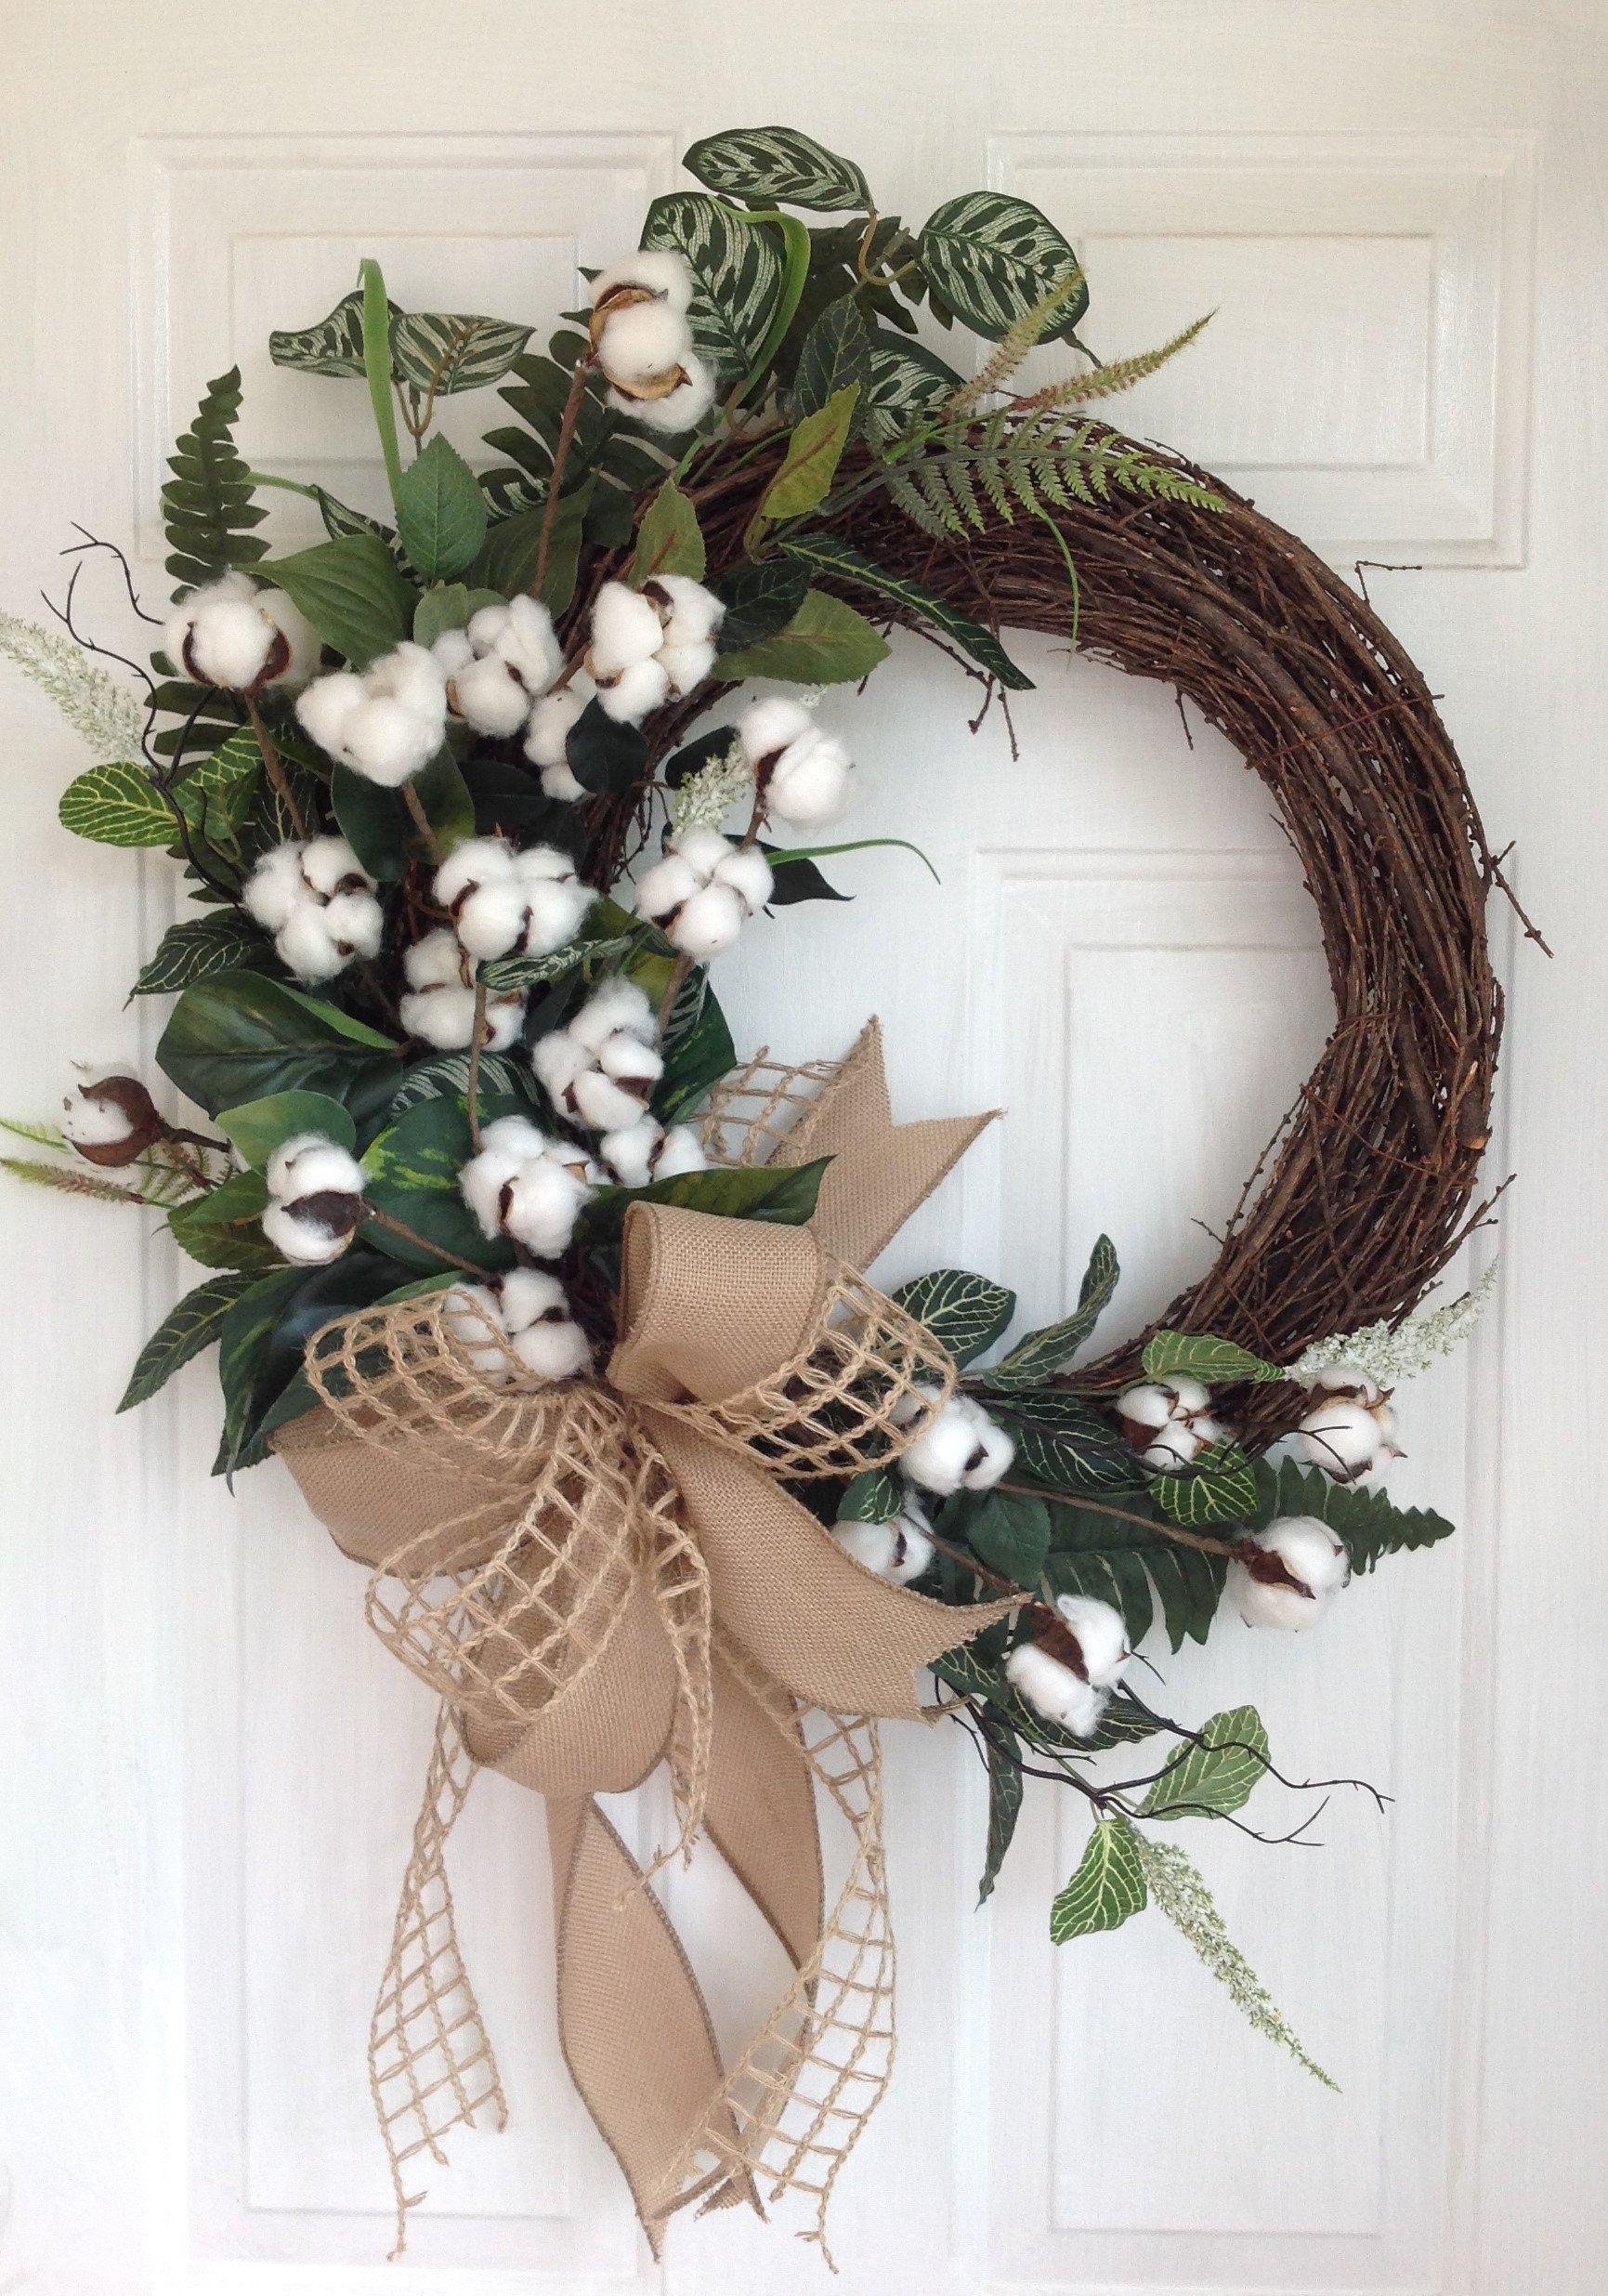 Spring Burlap Wreath-Year Round Wreath-Burlap Wreath-Front Door Wreath-Farmhouse Wreath-Spring Monogrammed Wreath-Modern Farmhouse Wreath